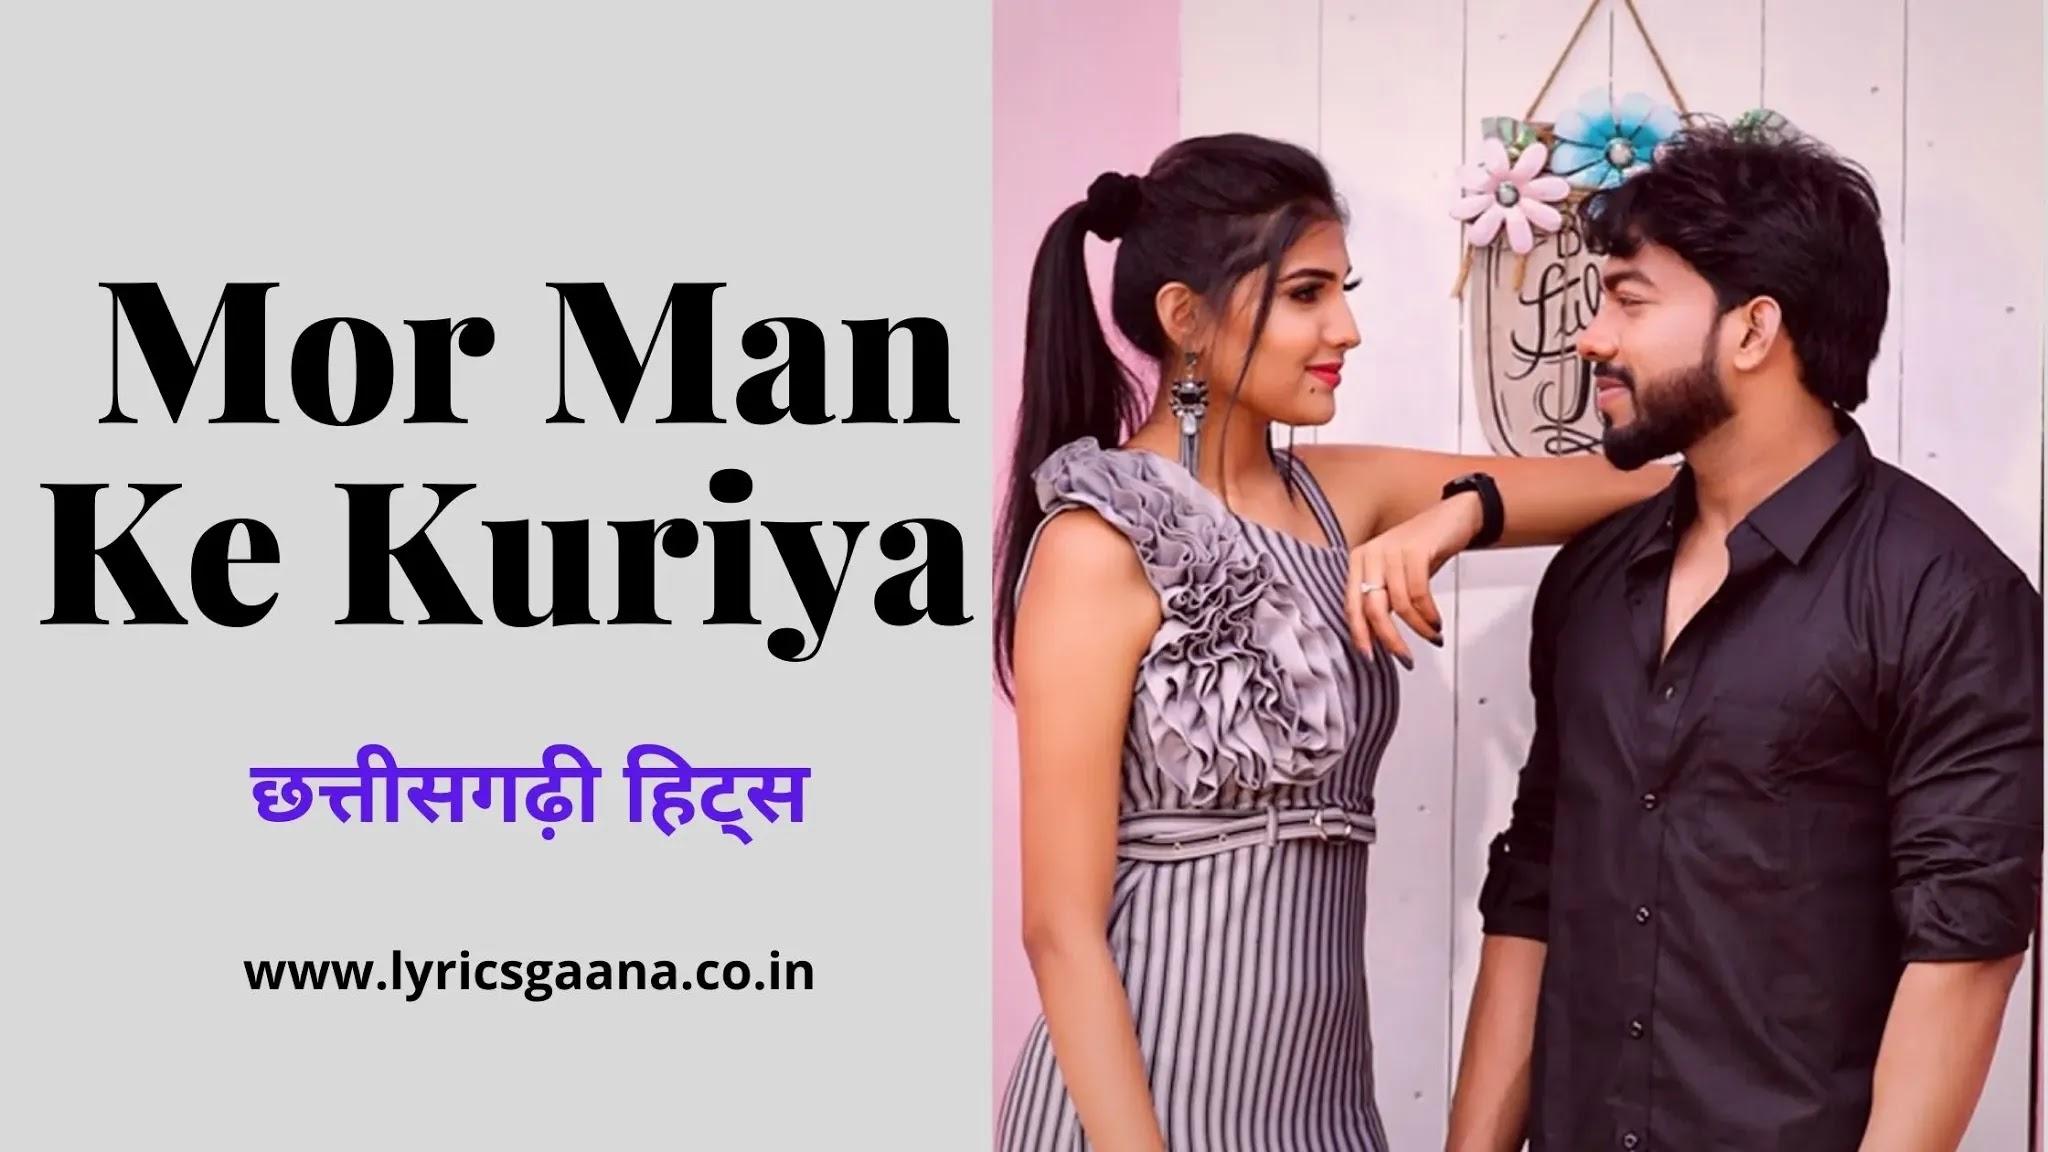 मोर मन के कुरिया | Mor Man Ke Kuriya New Cg Song Lyrics mp3